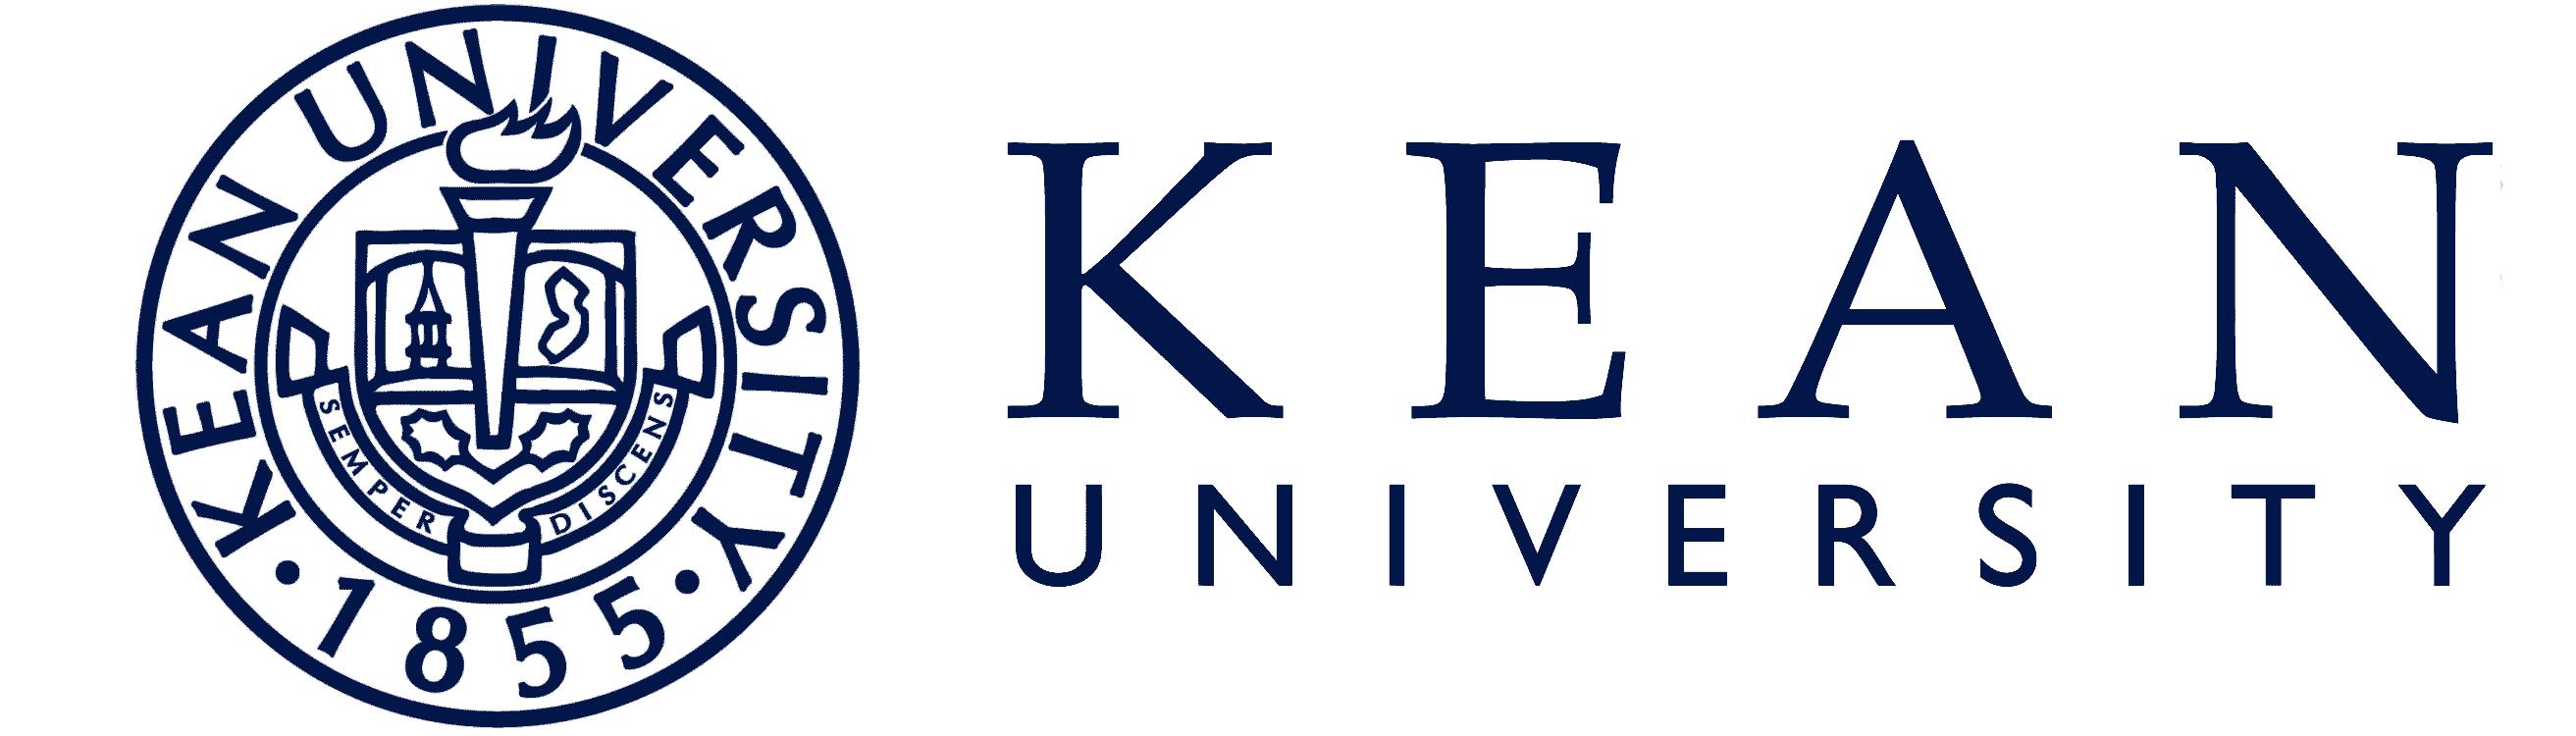 Kean University logo